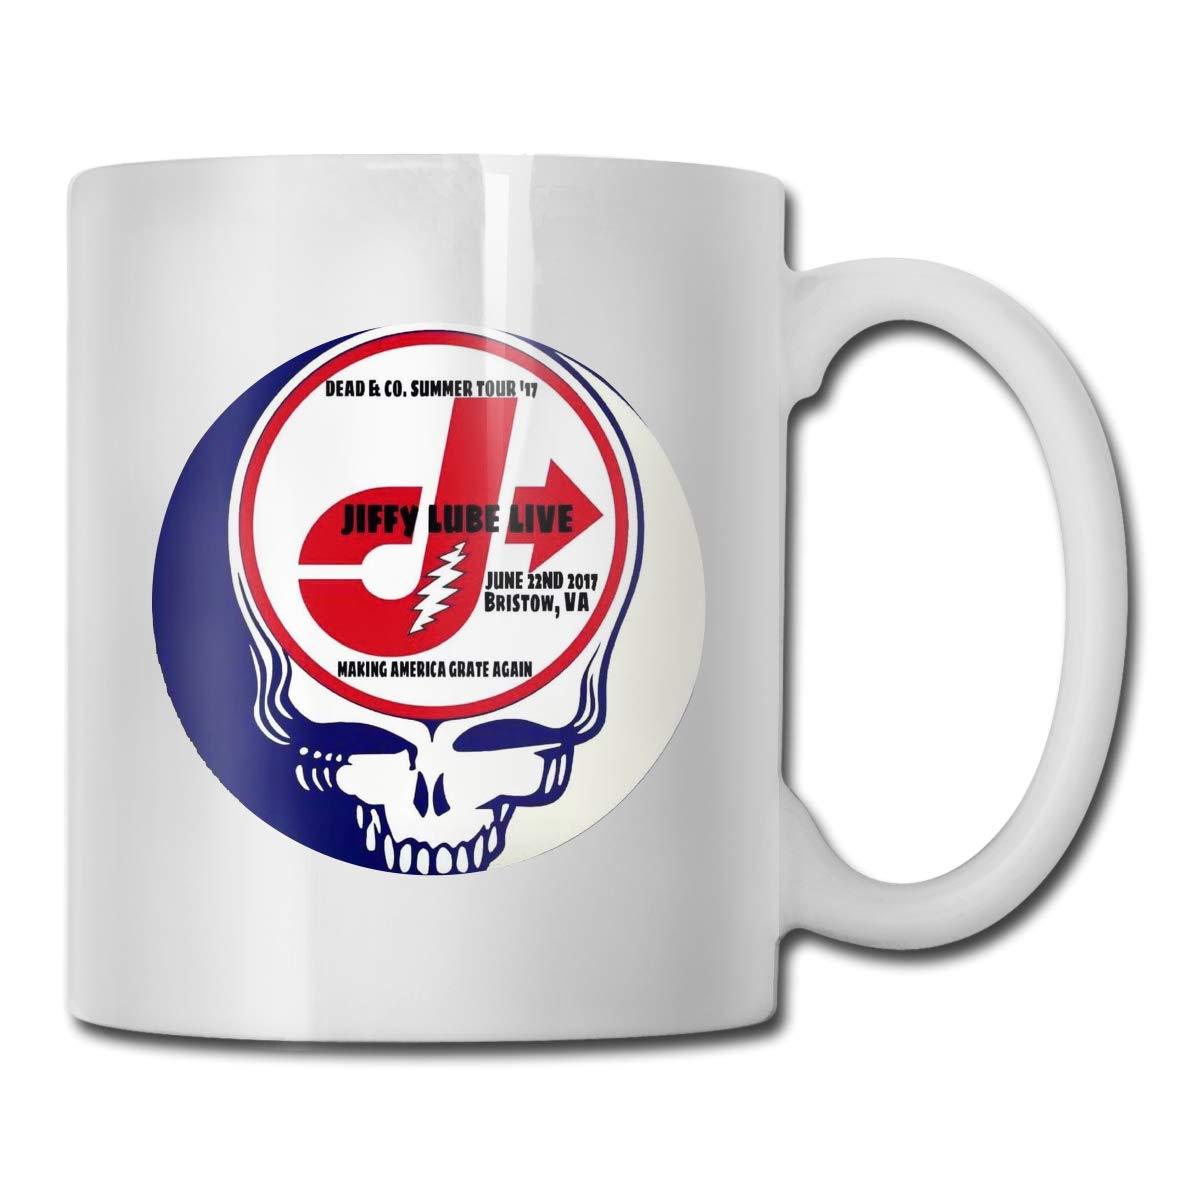 Office Coffee Cup GratefulDeadlogo2 Geblackus 14.72 OZ Capacity Mug is Perfect for CoffeeWhite